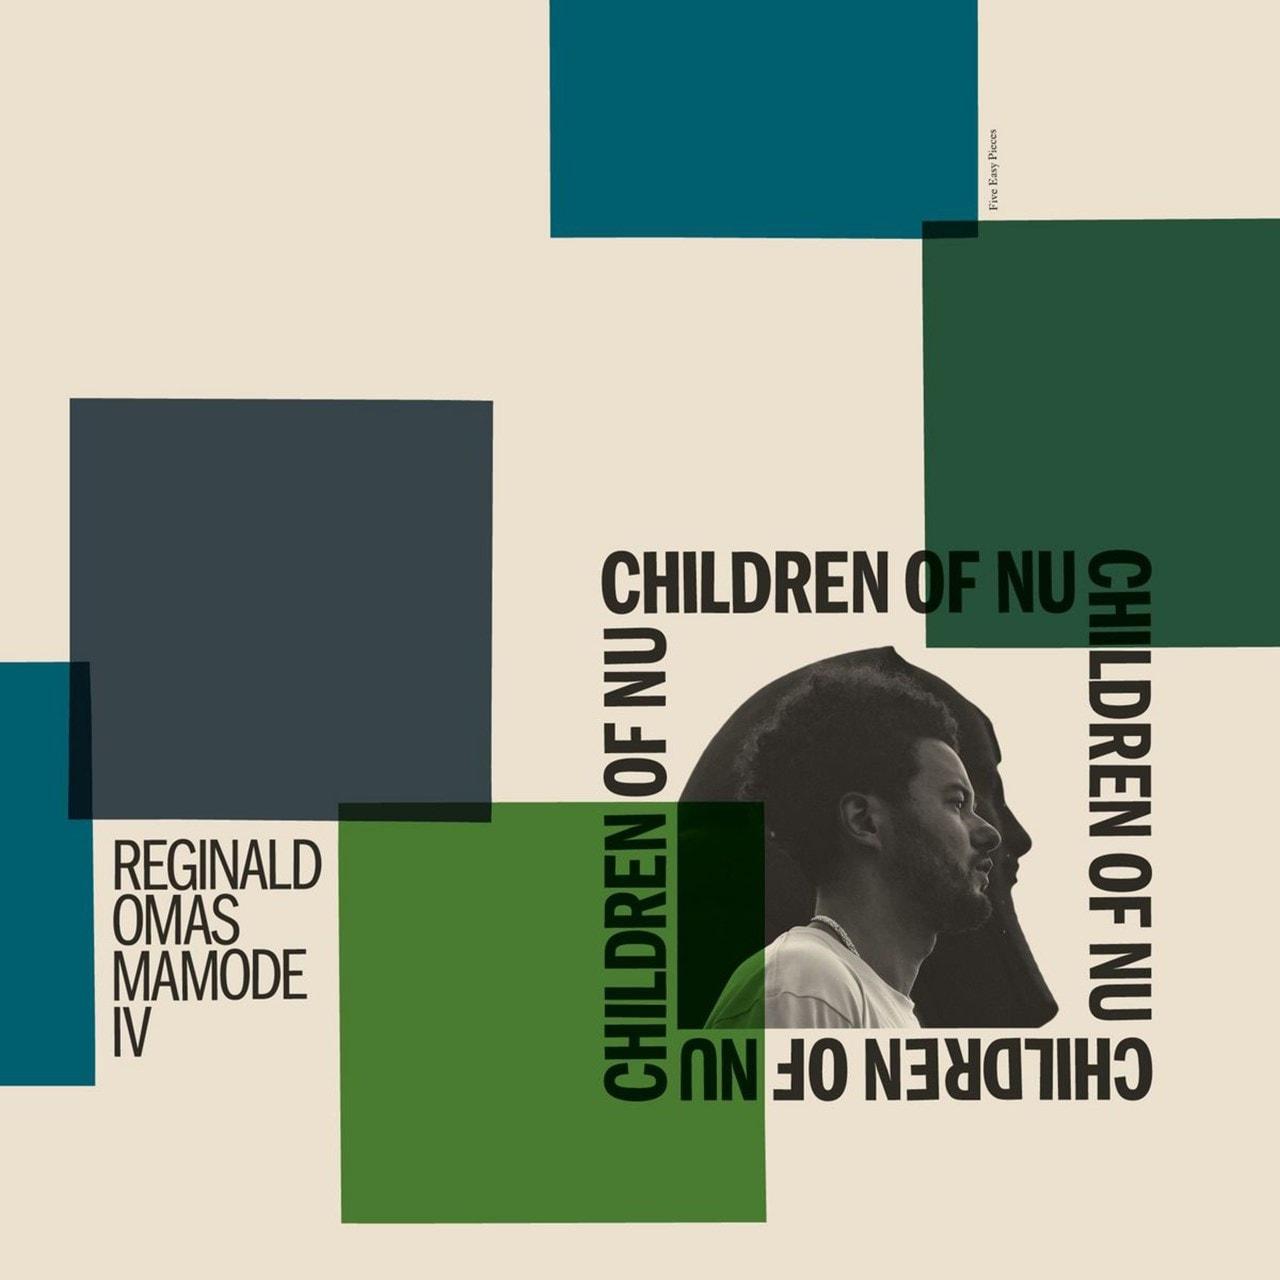 Children of Nu - 1